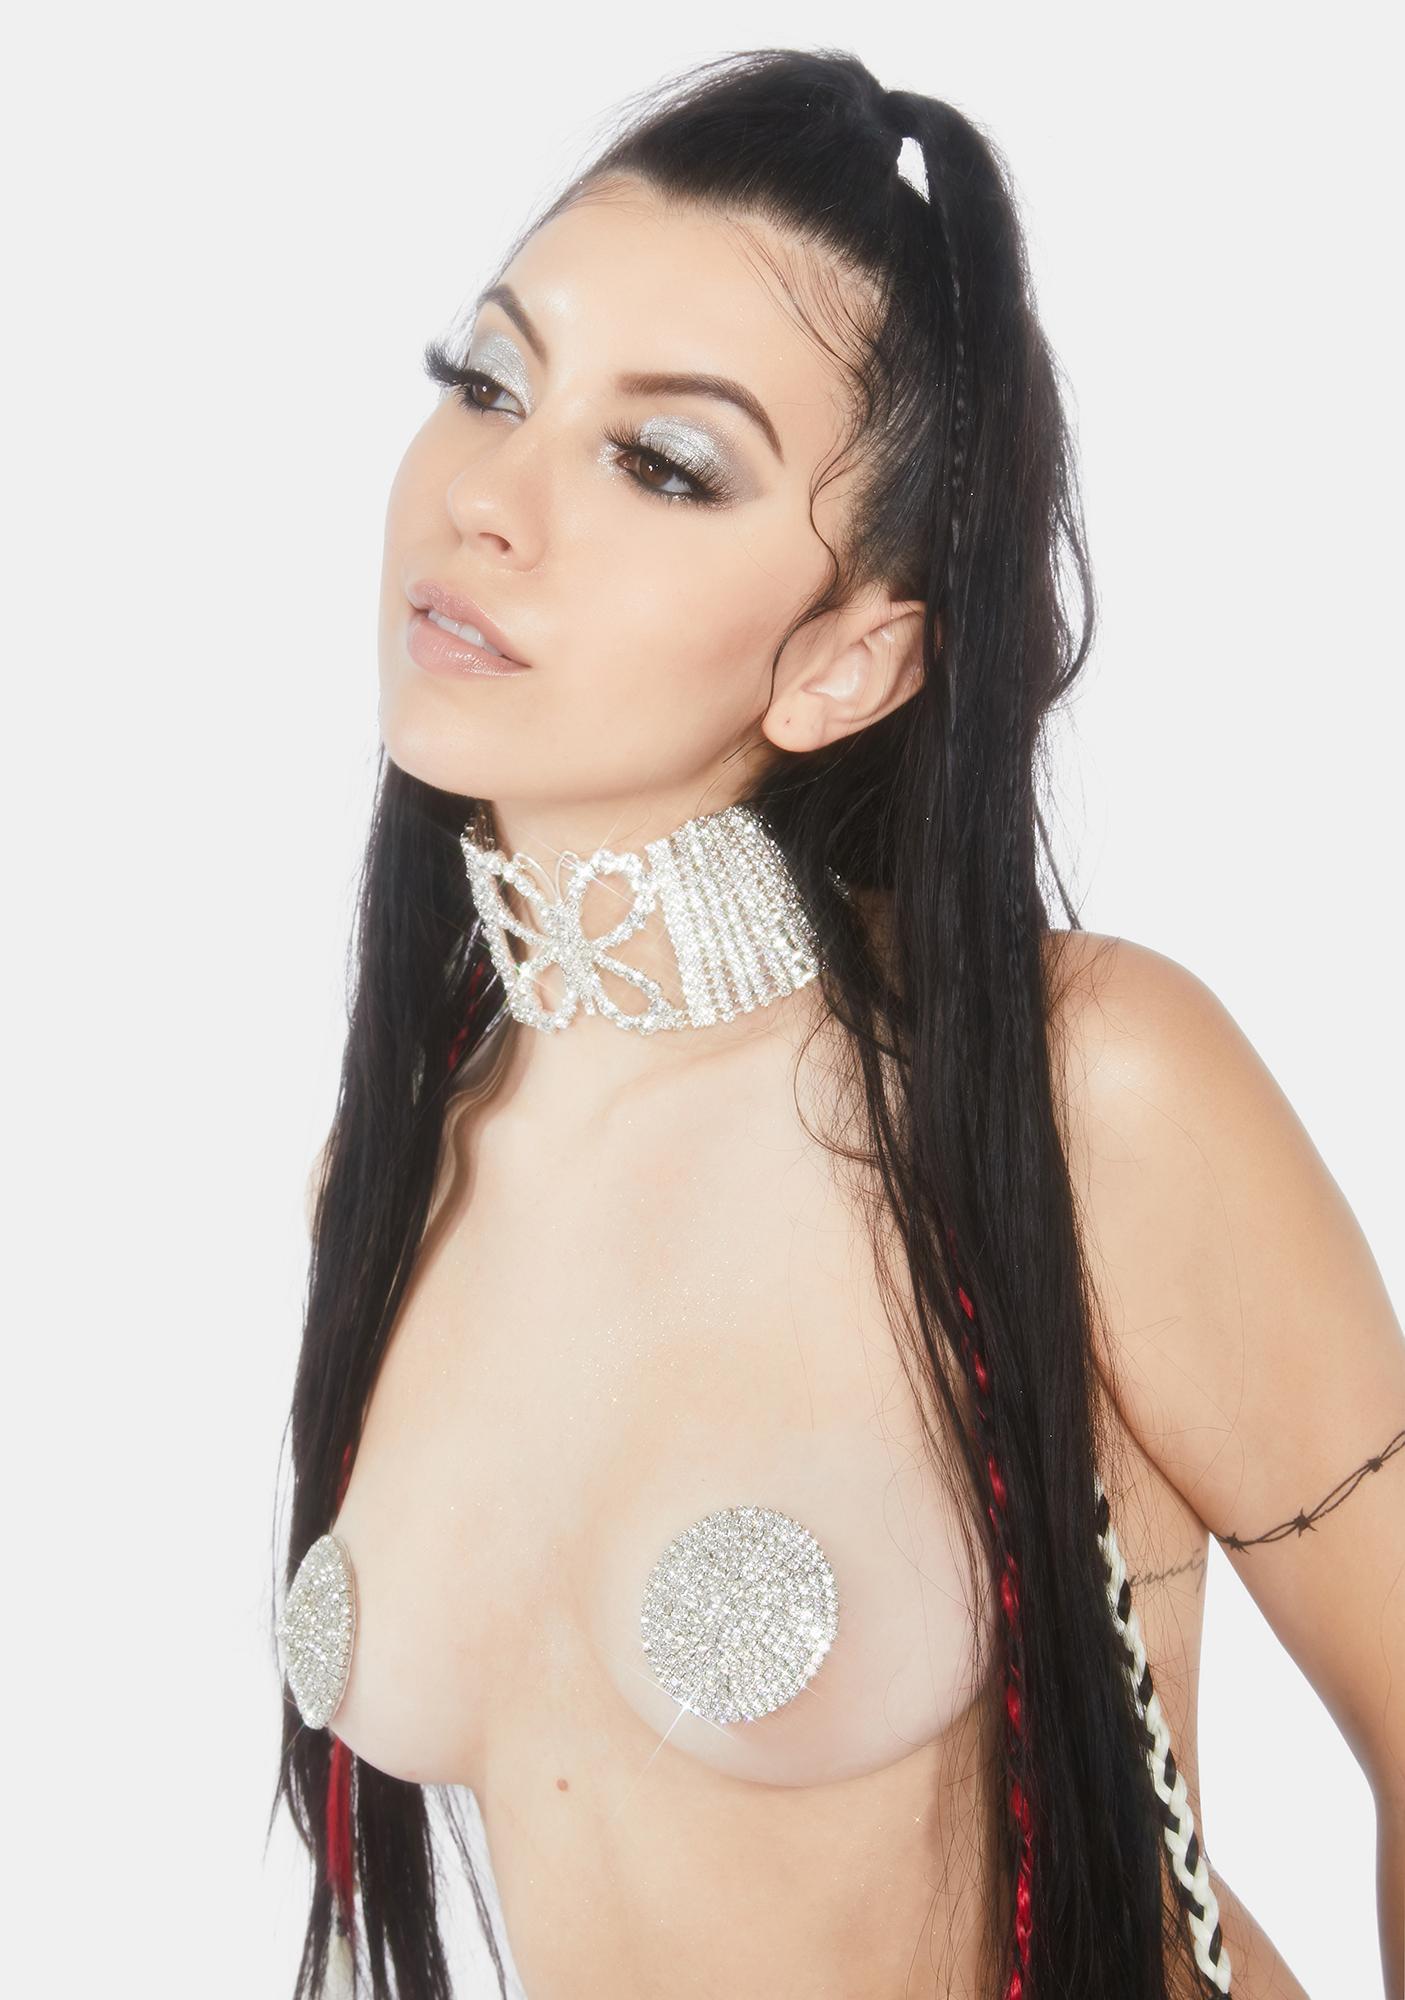 Neva Nude Crystal Cage Reusable Pasties